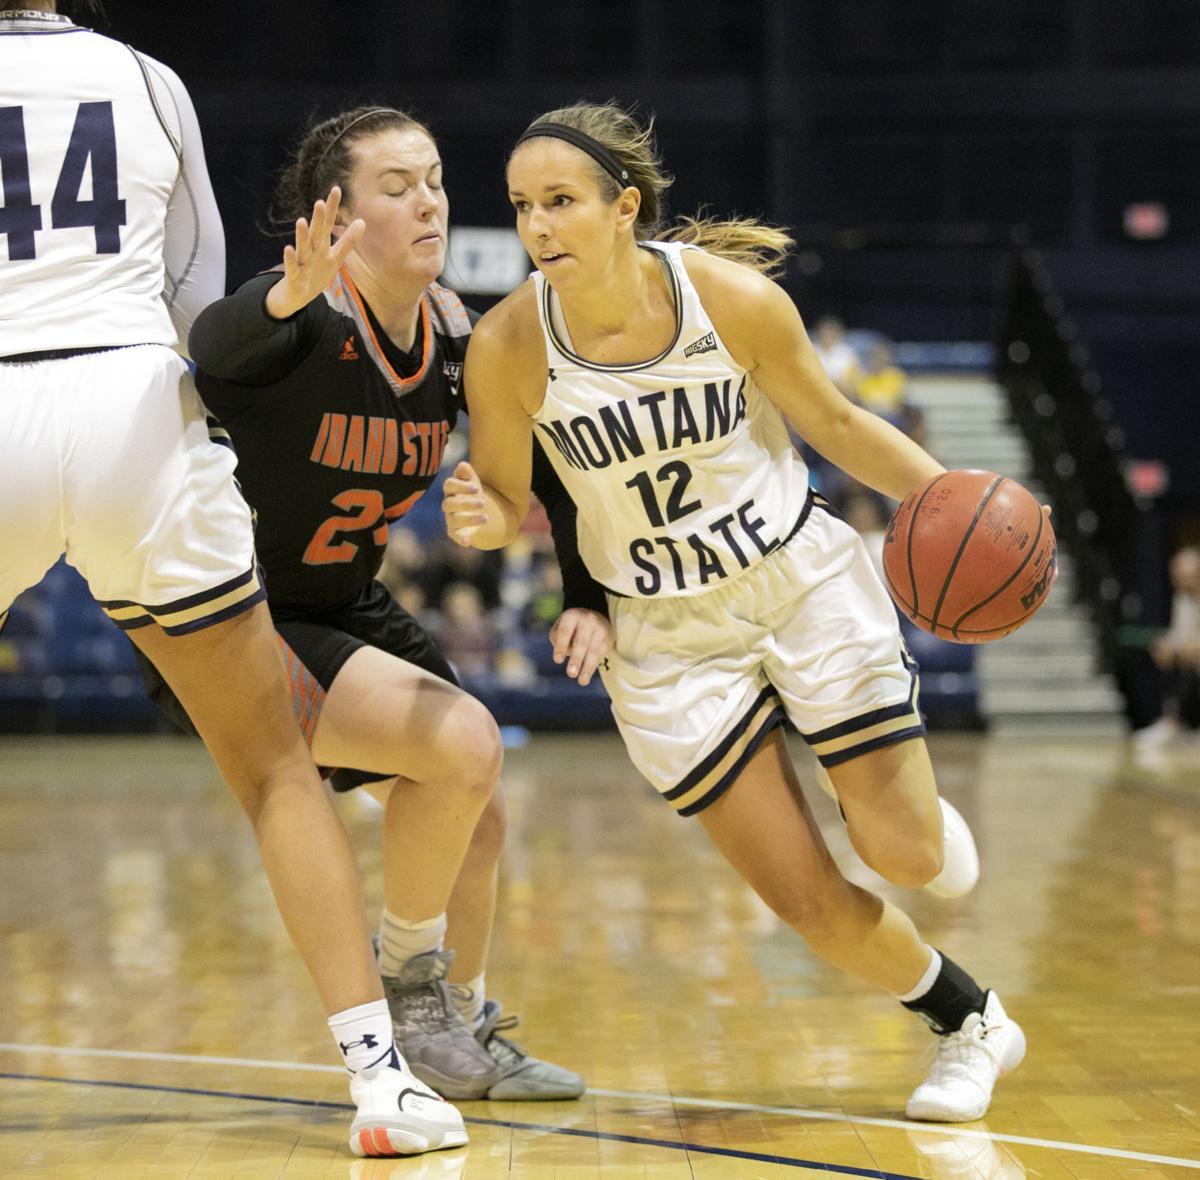 MSU v Idaho State Women's Hoops